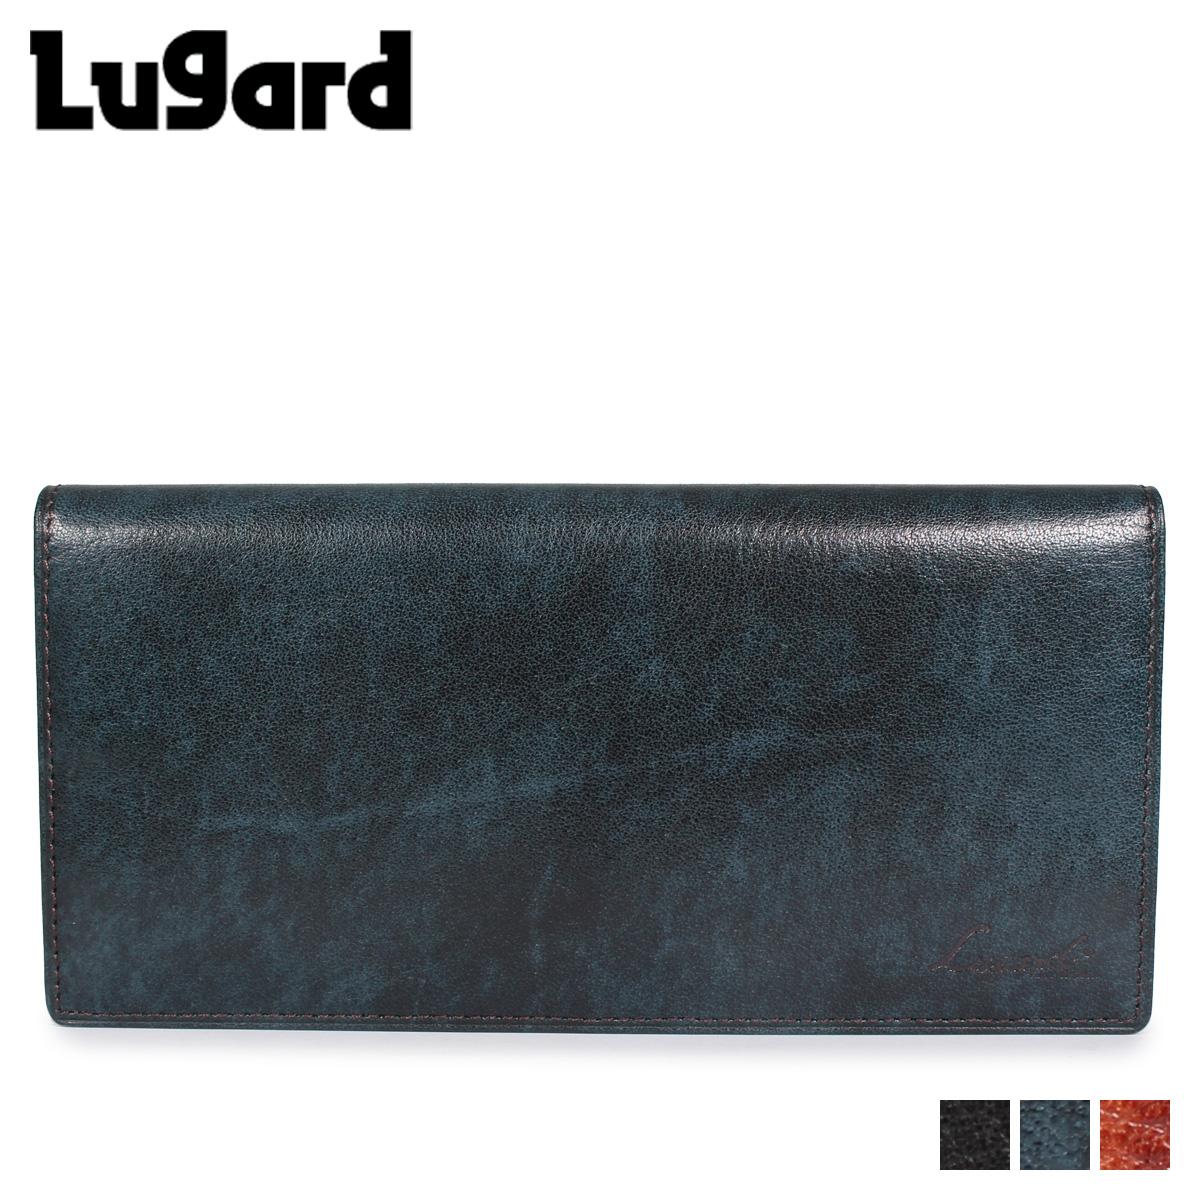 Lugard ラガード 青木鞄 ジースリー 財布 長財布 二つ折り メンズ G3 WALLET ブラック ネイビー ブラウン 黒 5188